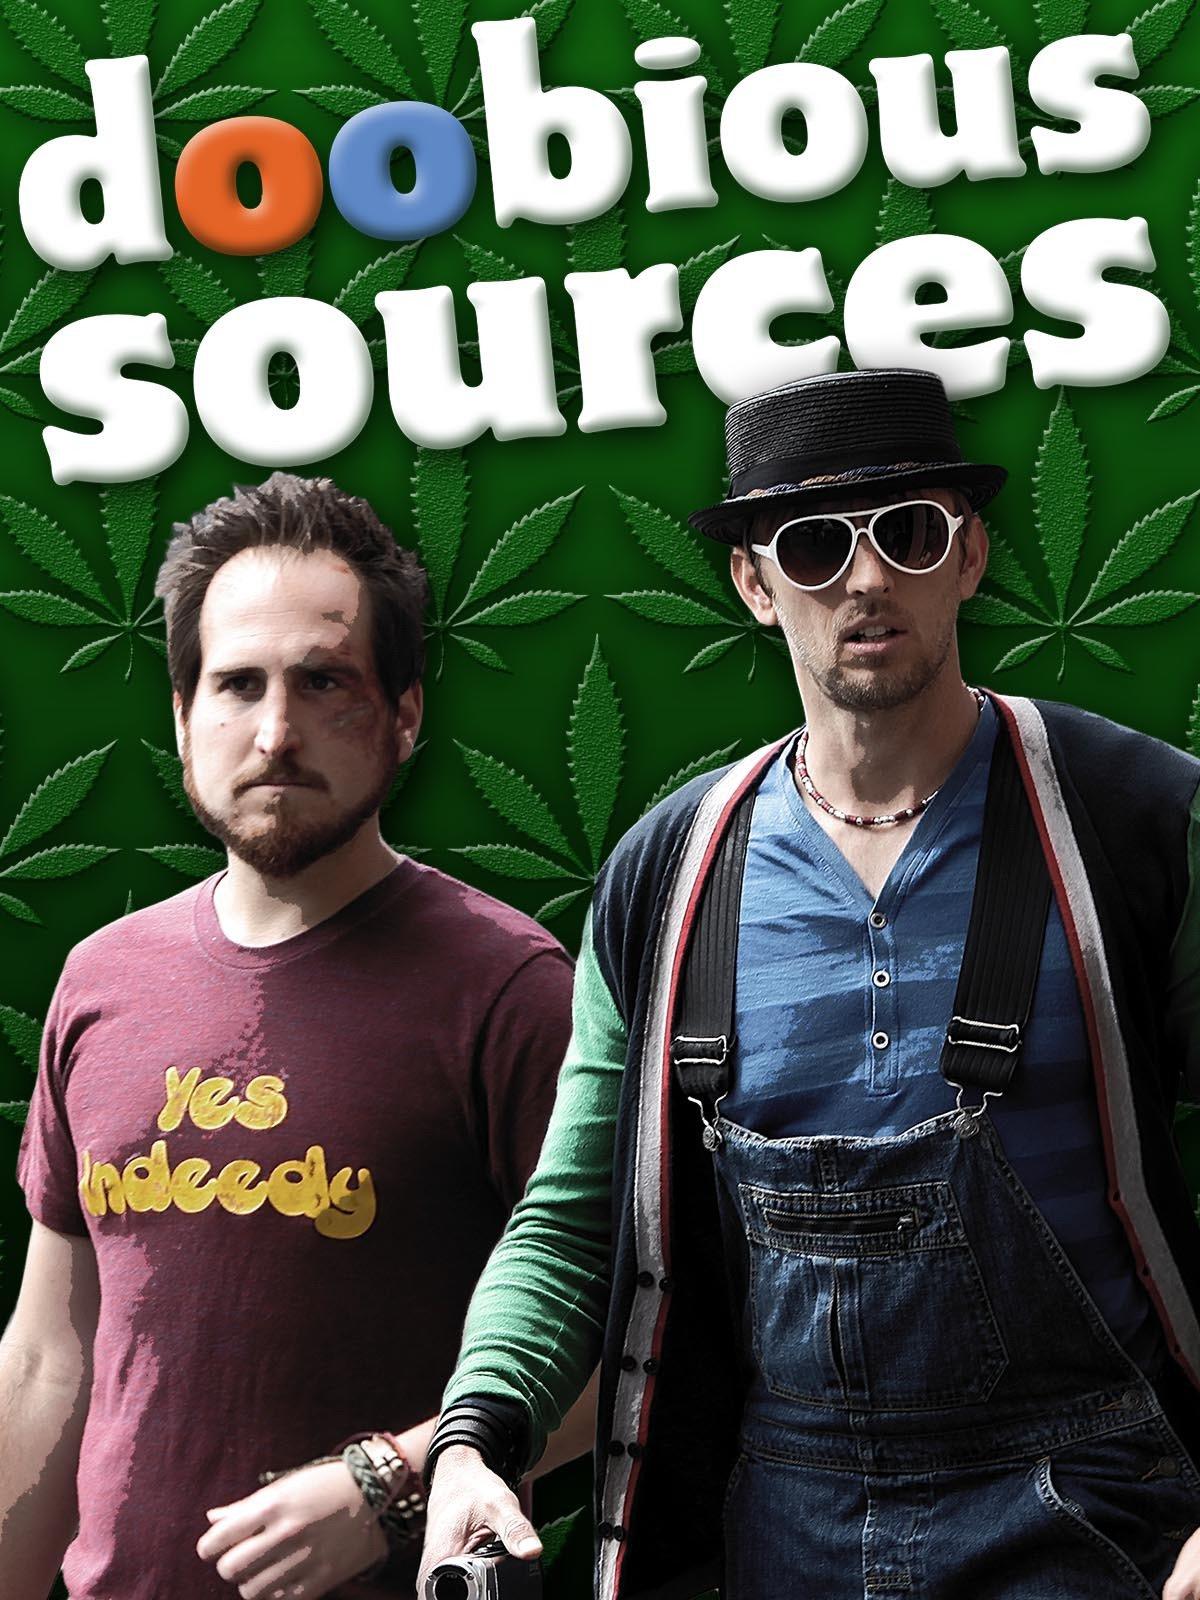 Doobious Sources on Amazon Prime Video UK